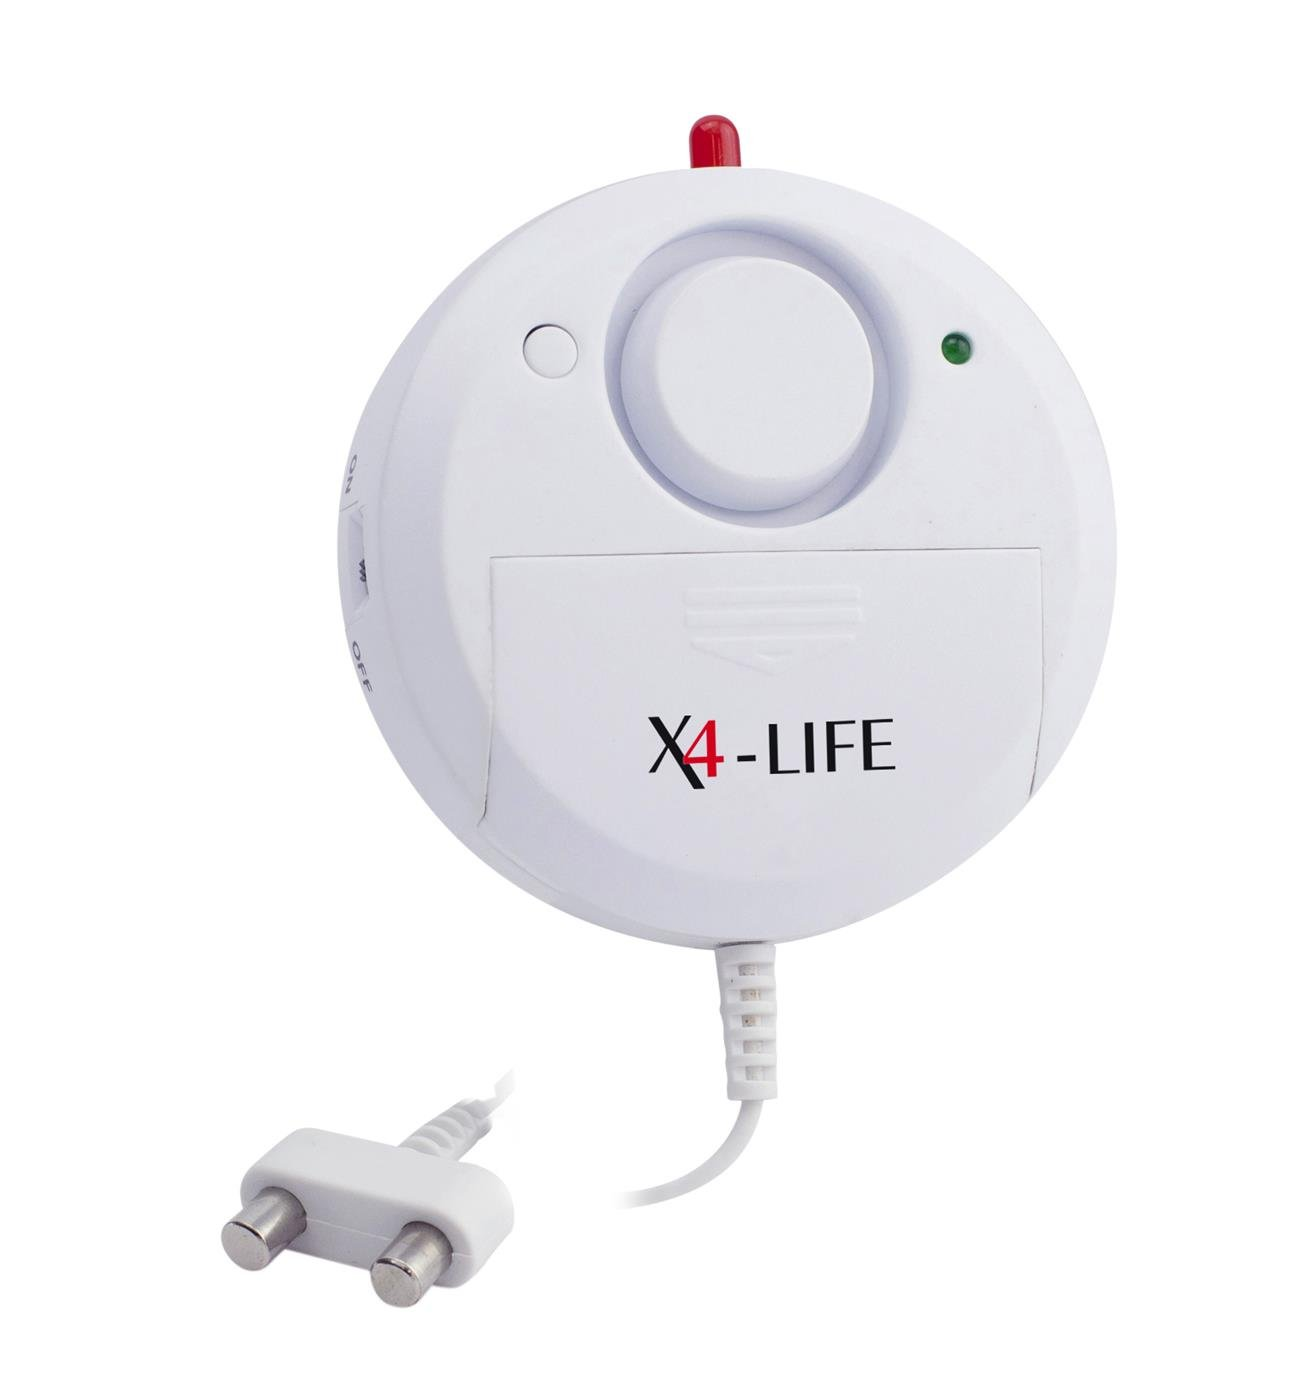 X4-LIFE 701332 120dB Color blanco timbre de - Alarma product image